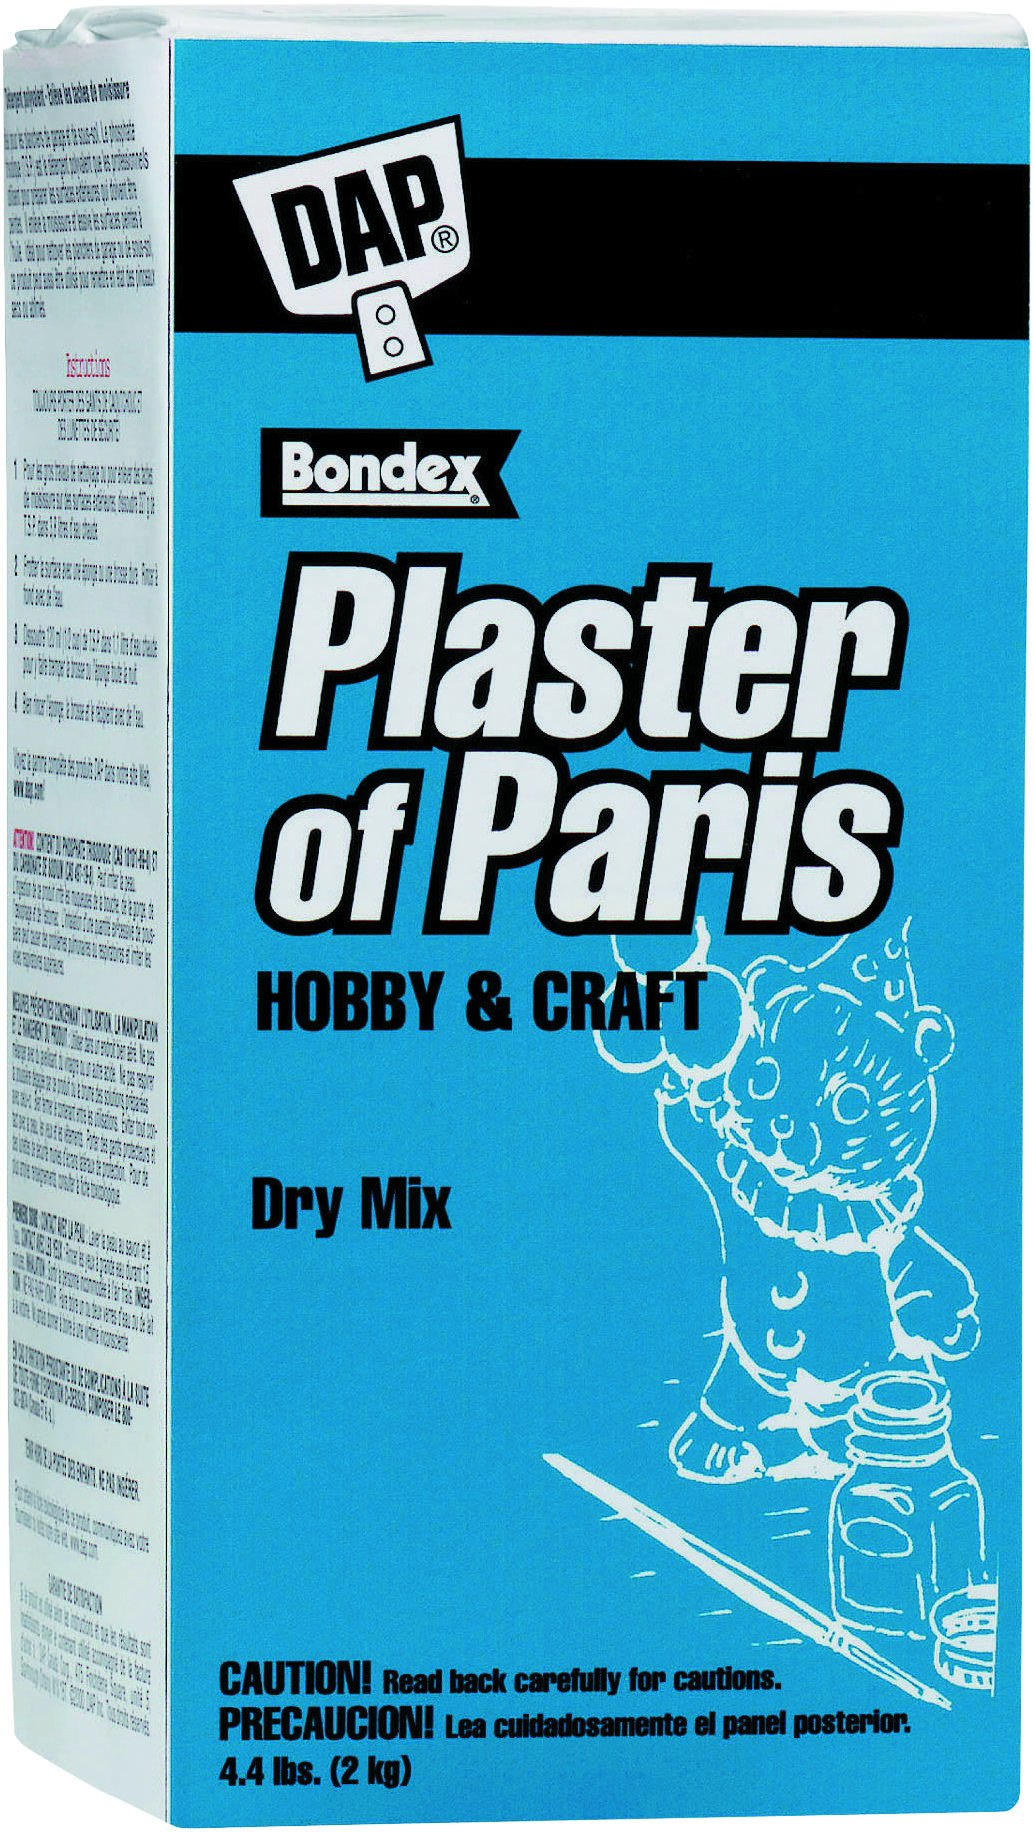 Dap Bulk Buy Plaster of Paris 4.4 lb. Box White 53005 (6-Pack)